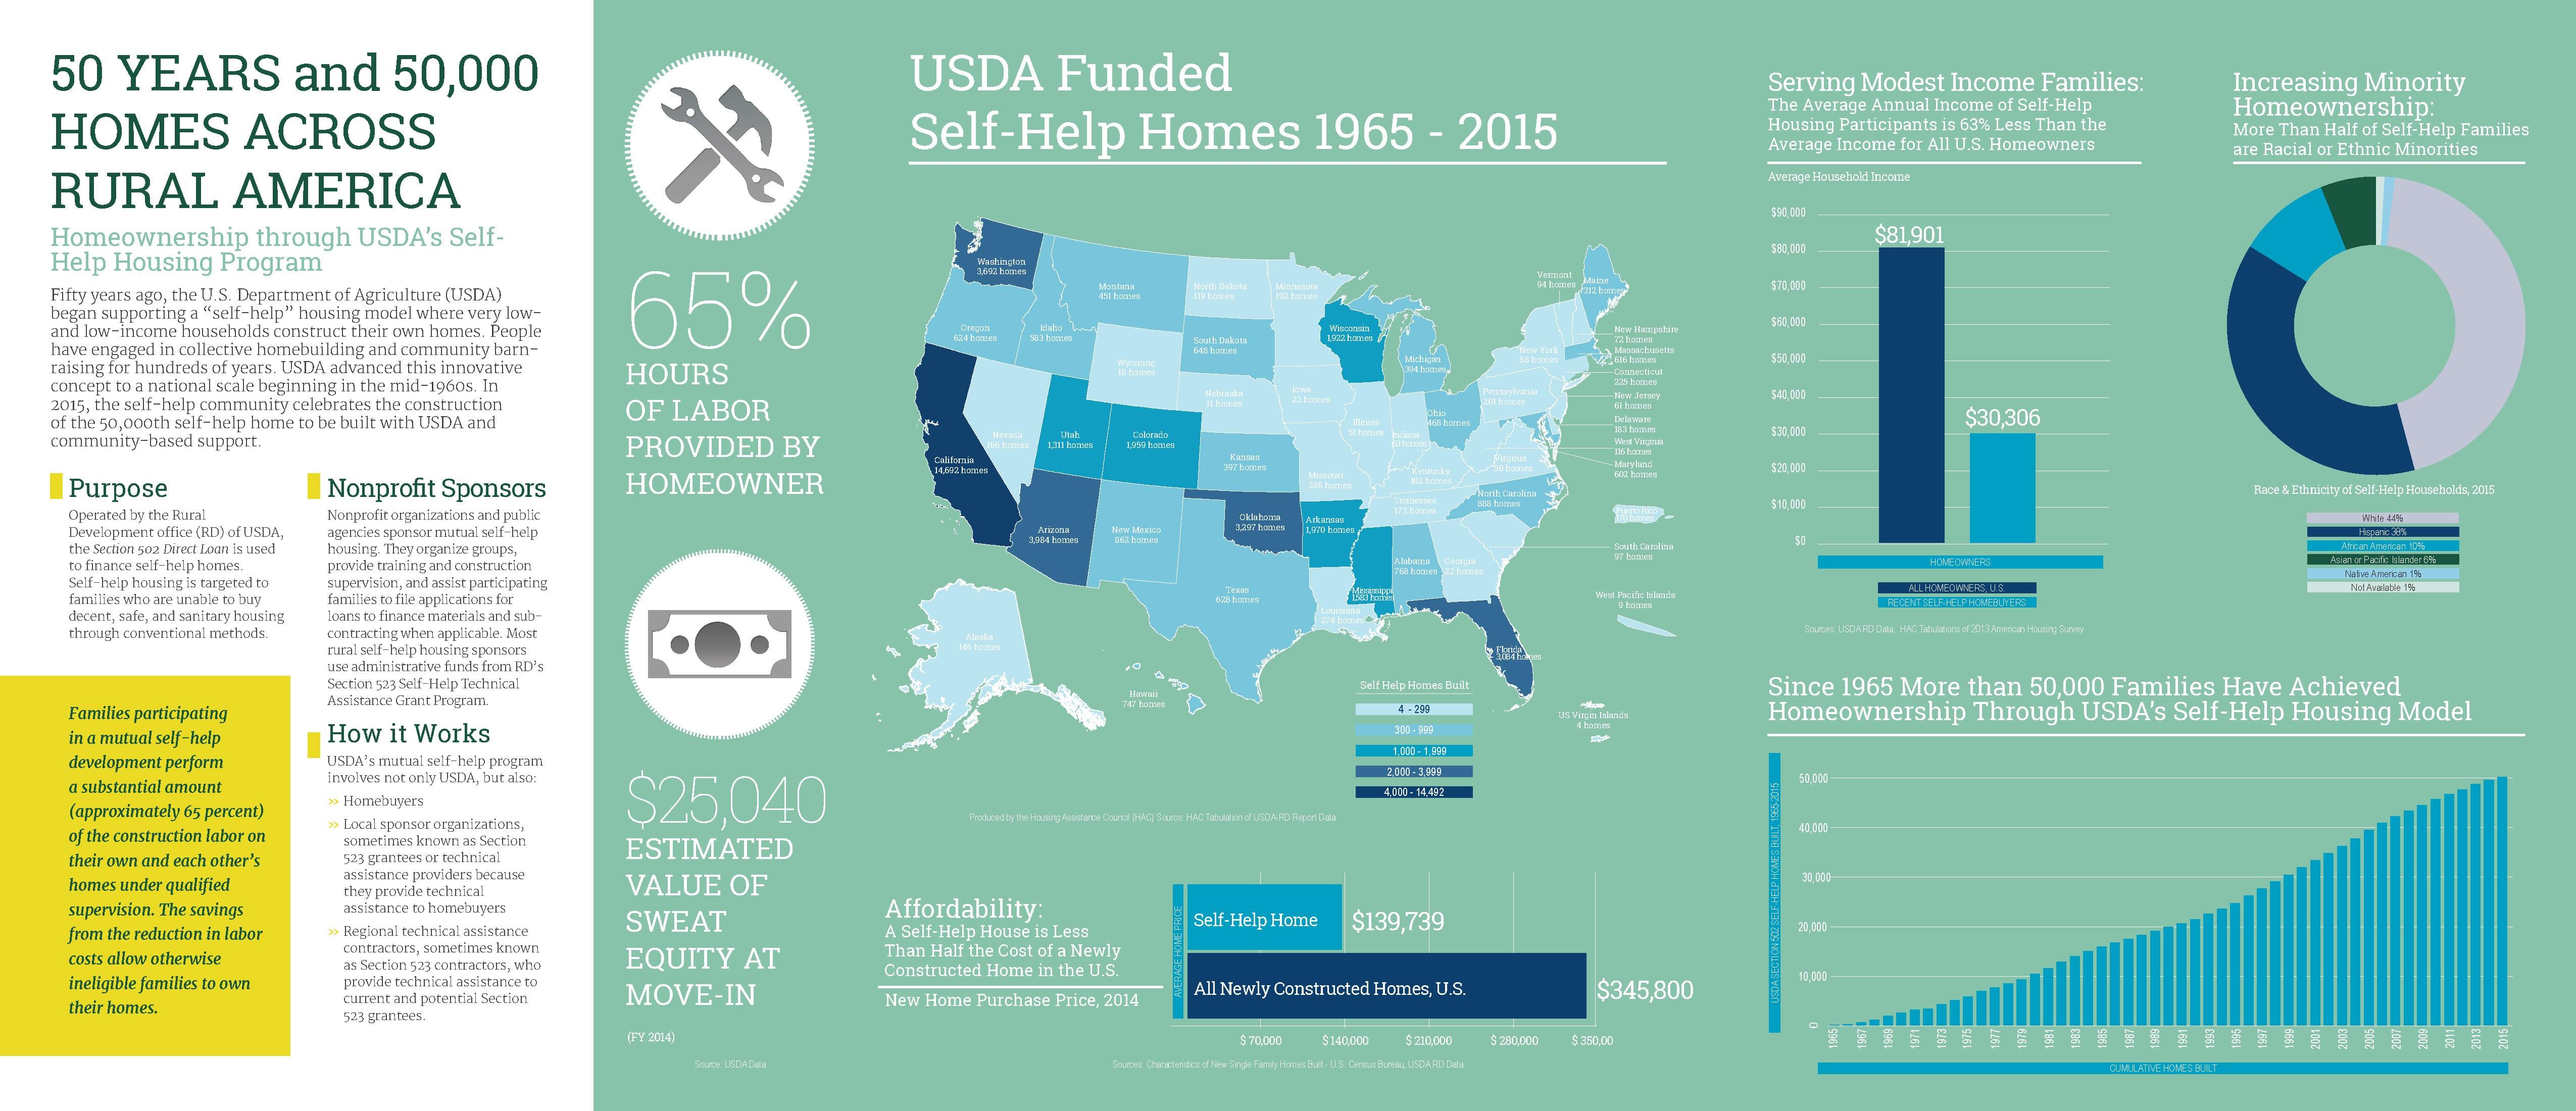 rvsummer2015-infographic Page 2